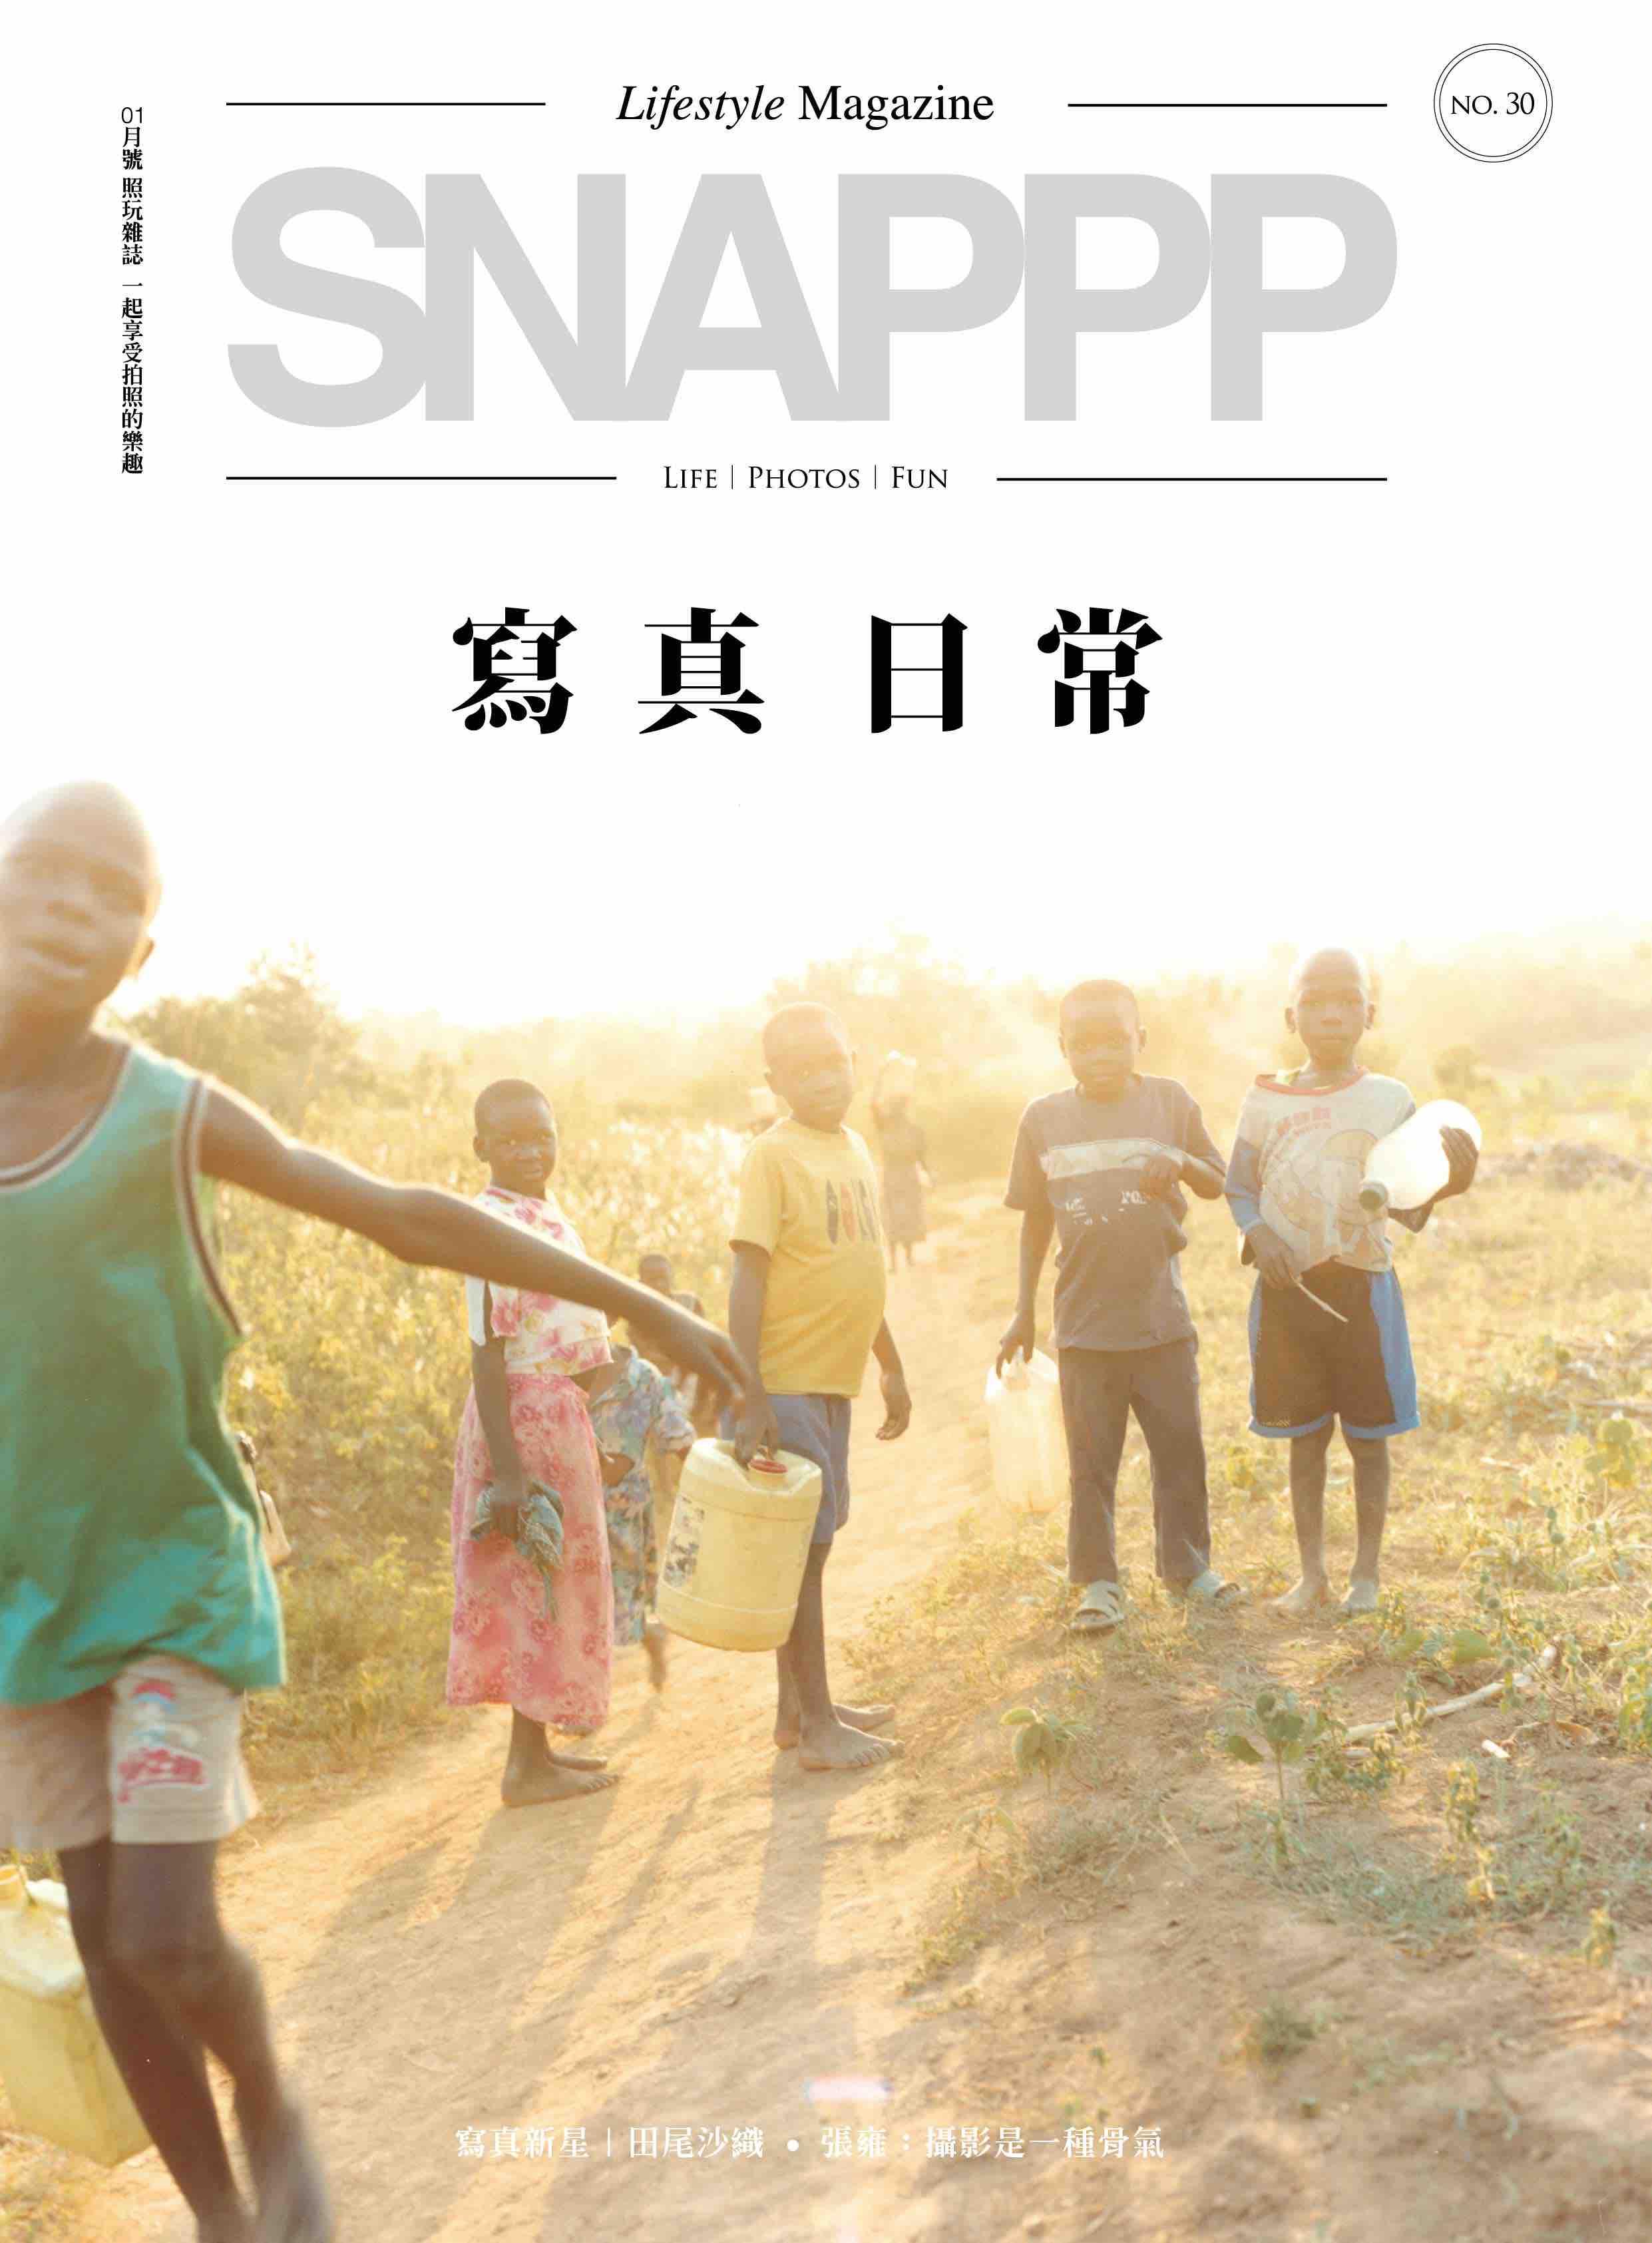 SNAPPP-NO30 COVER-ver1.jpg